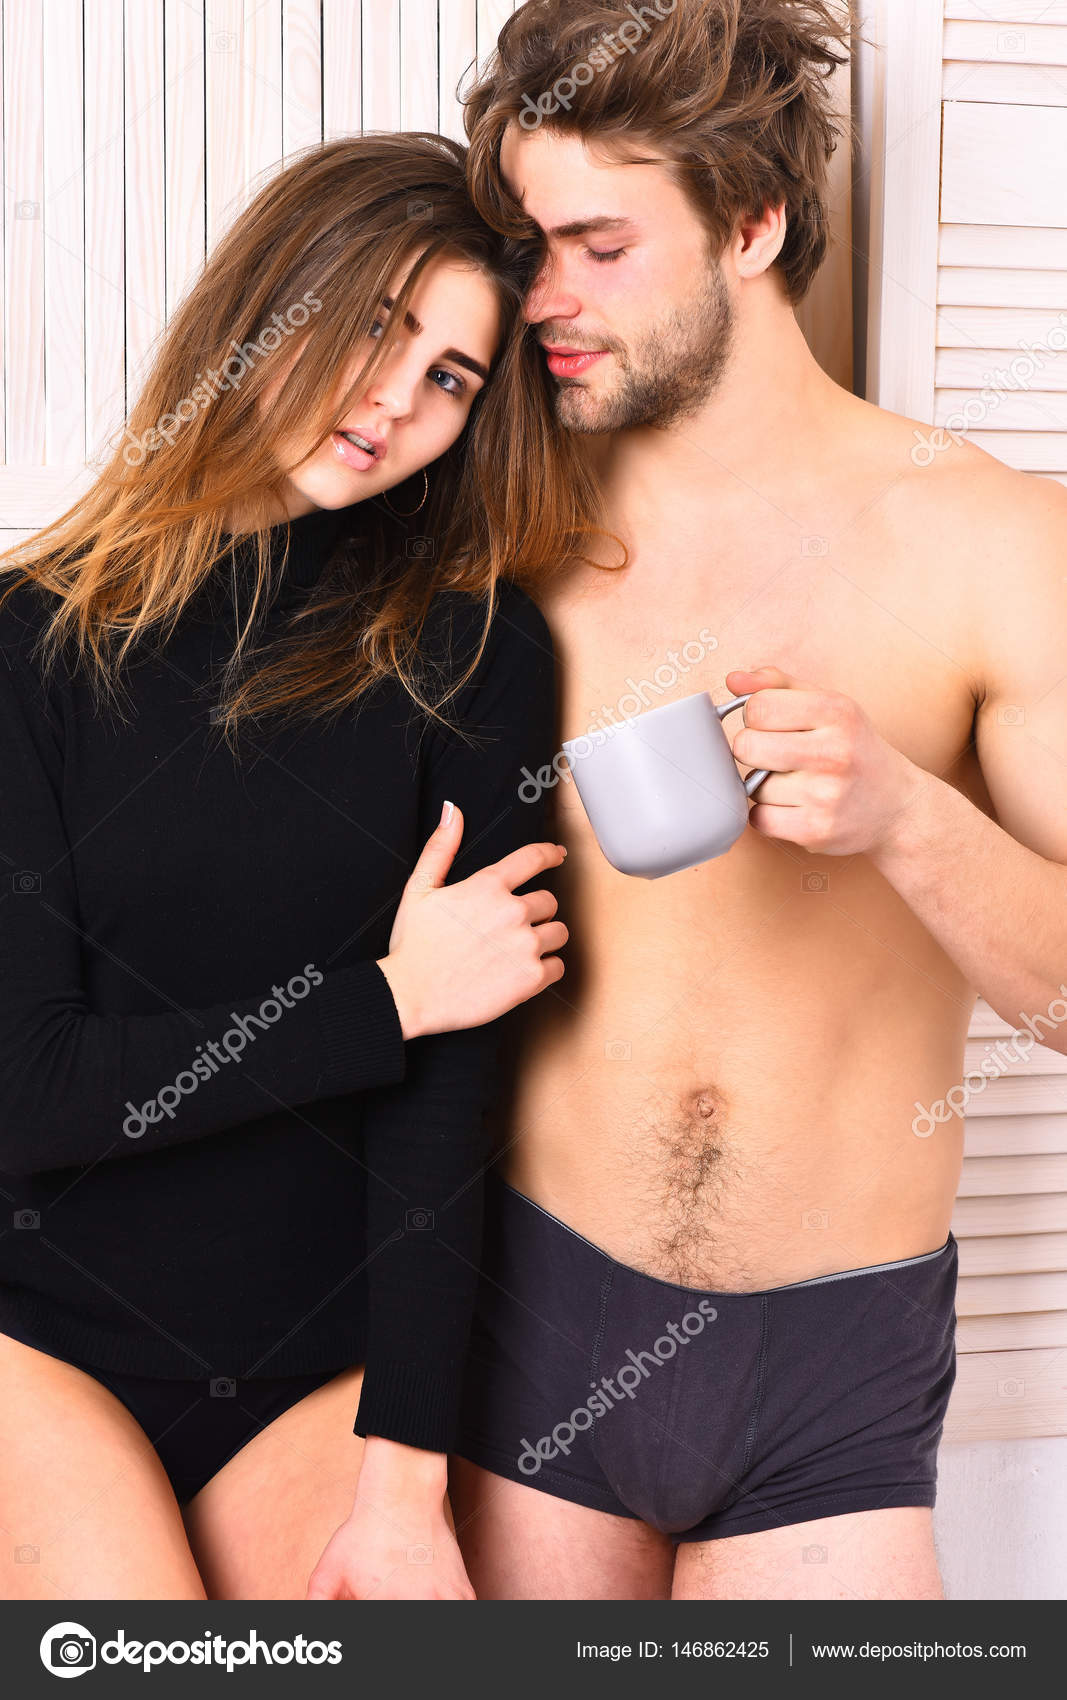 sexsy-girl-boys-adult-pic-kim-wilde-nud